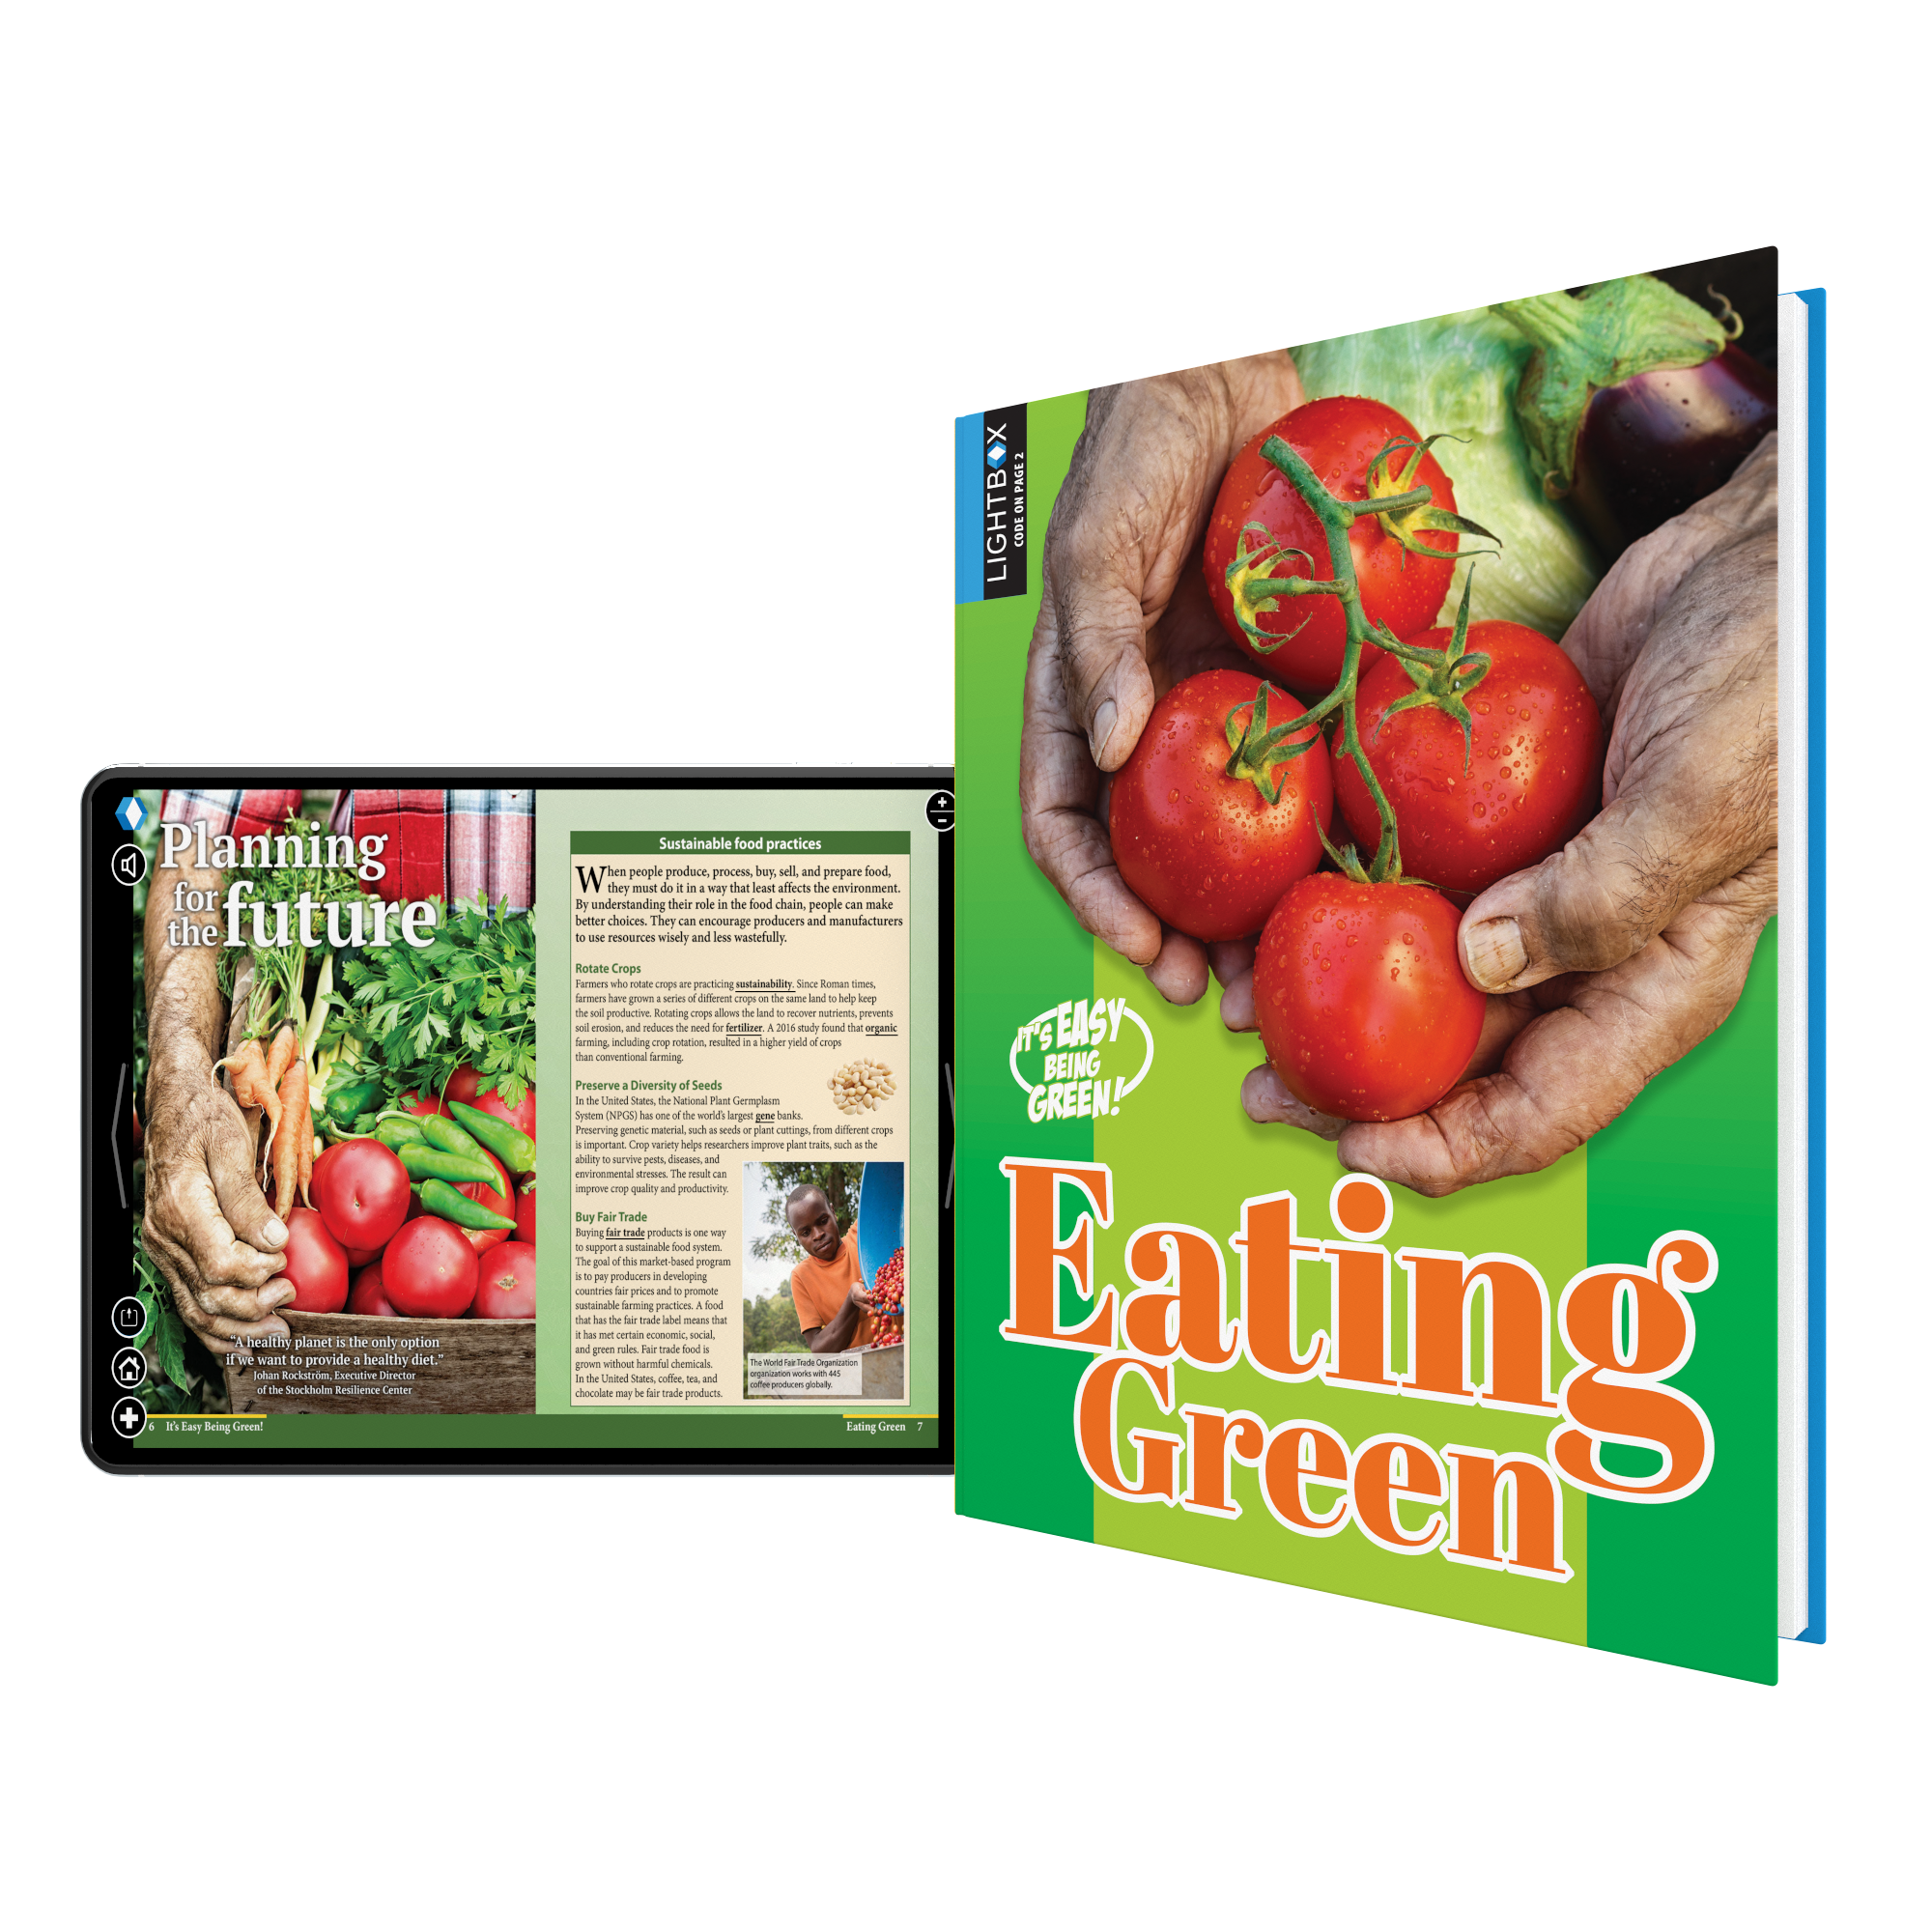 eating_green